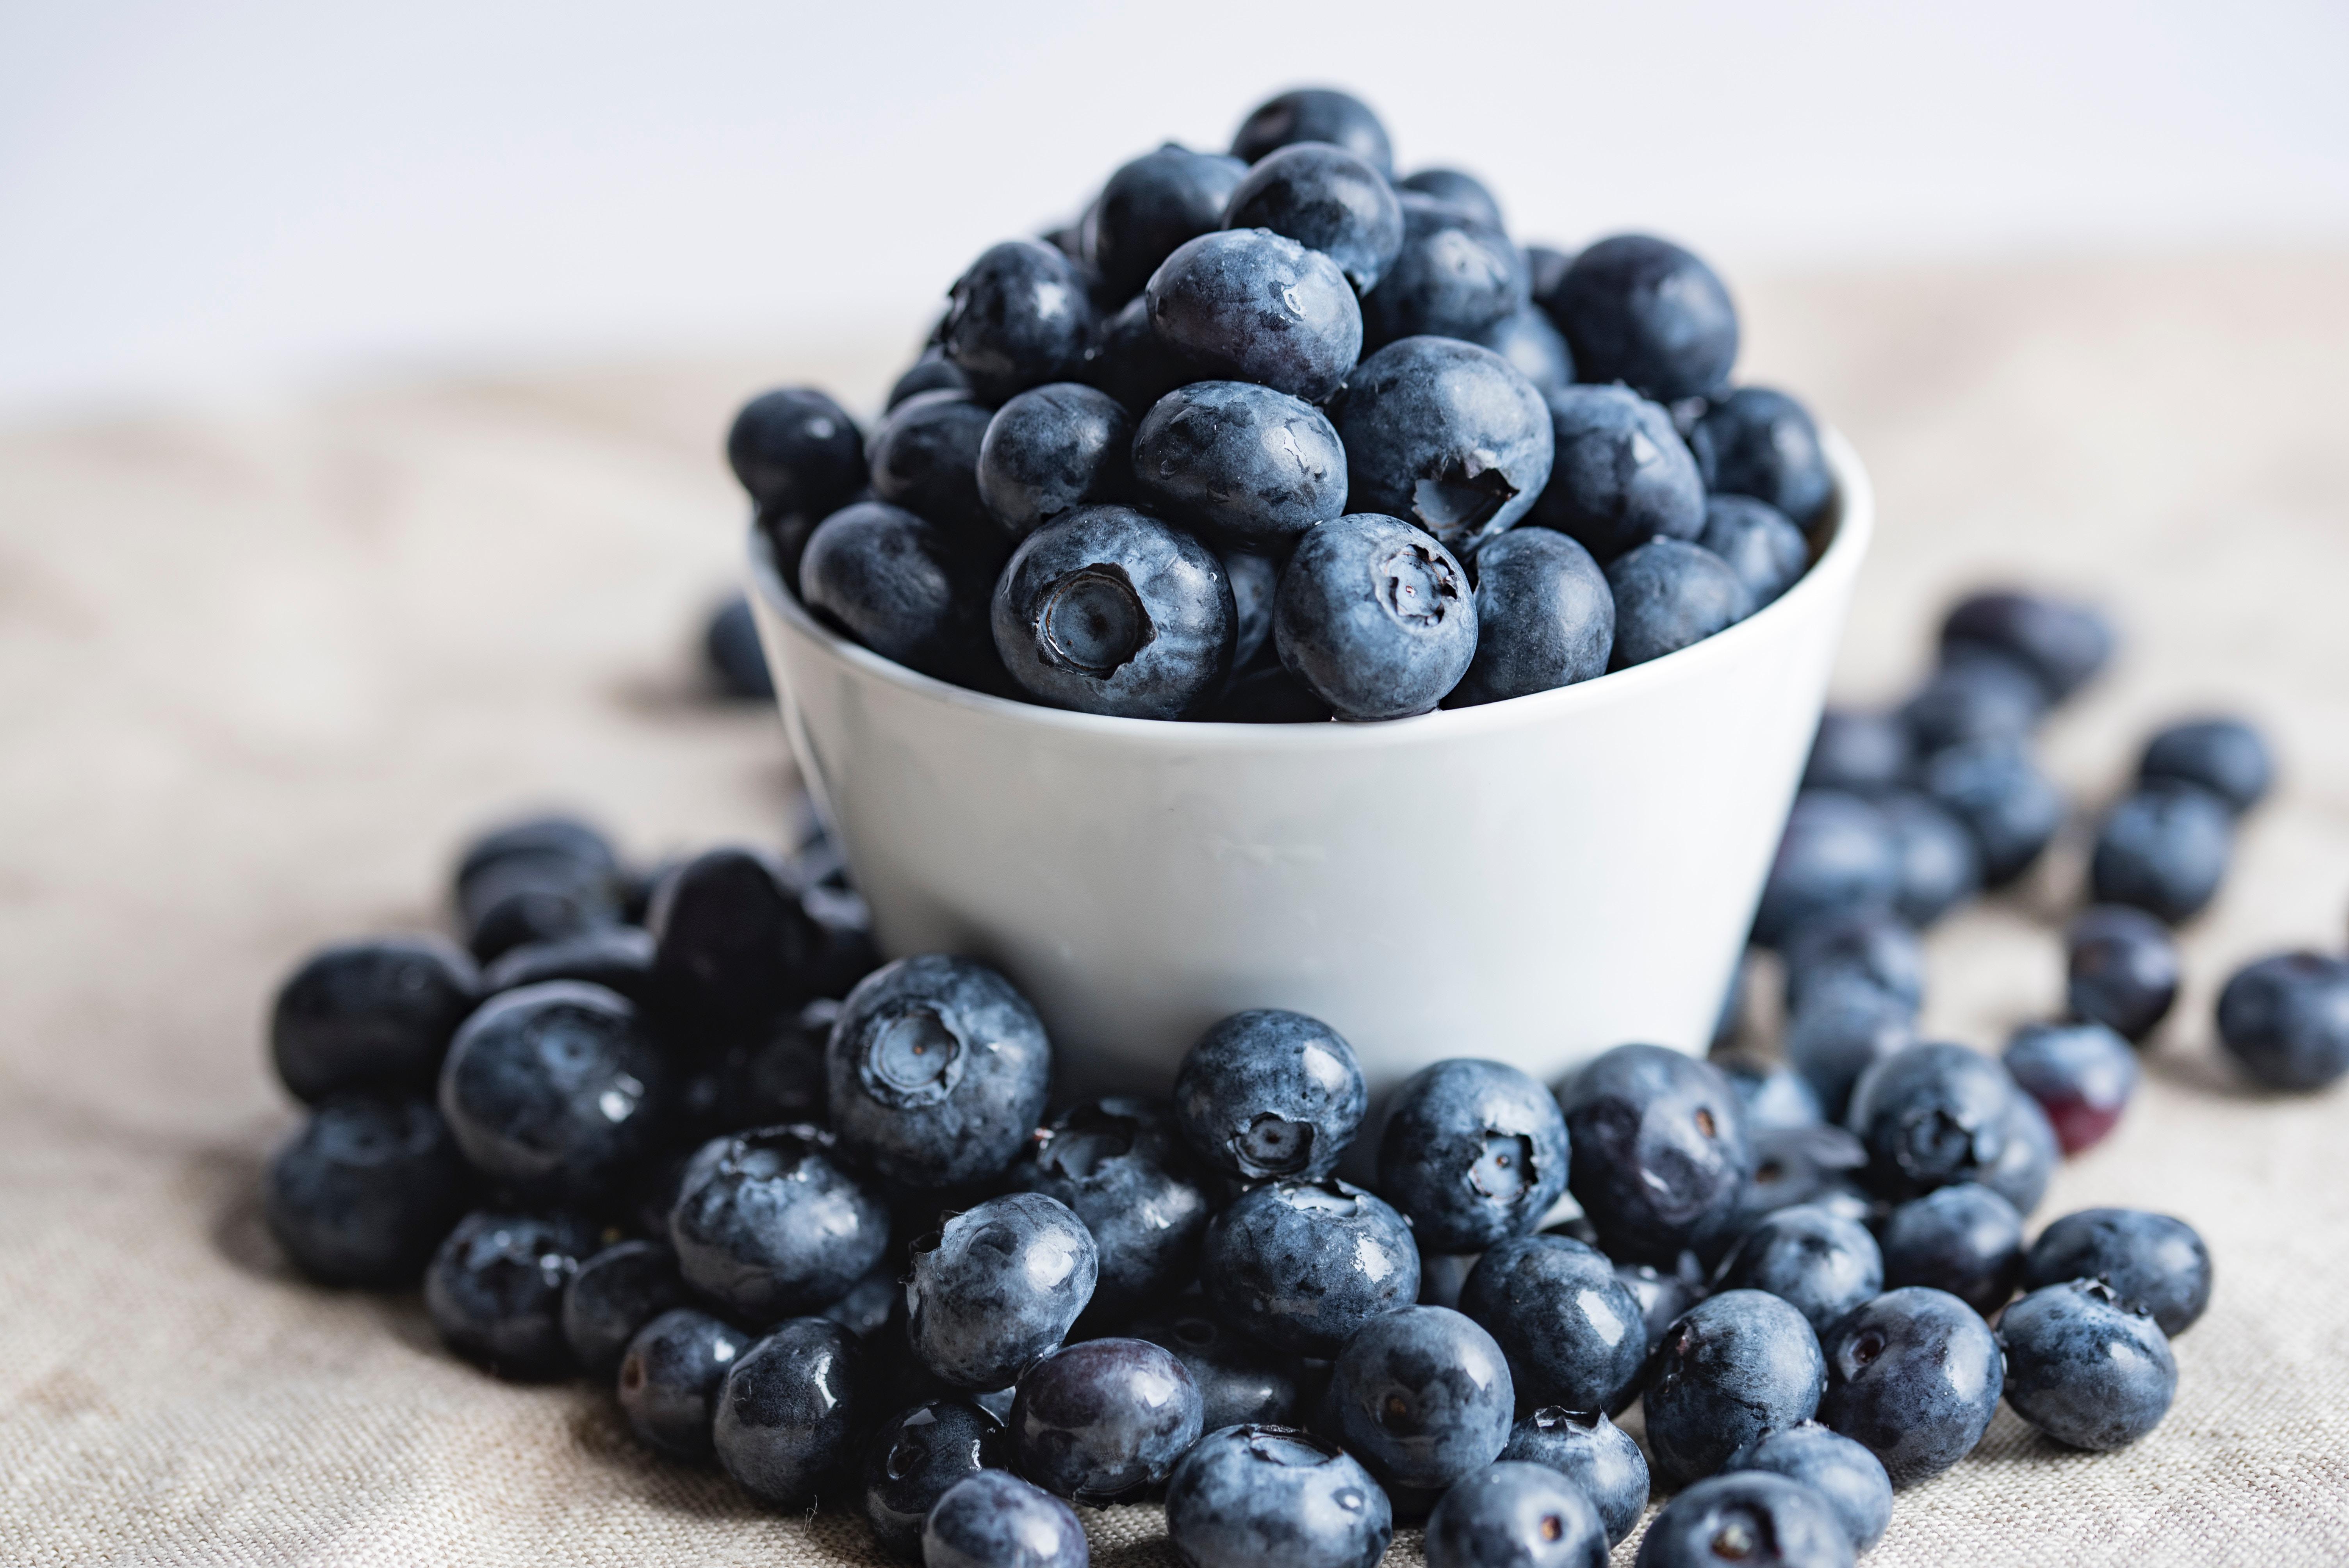 ingiere antioxidantes.jpg